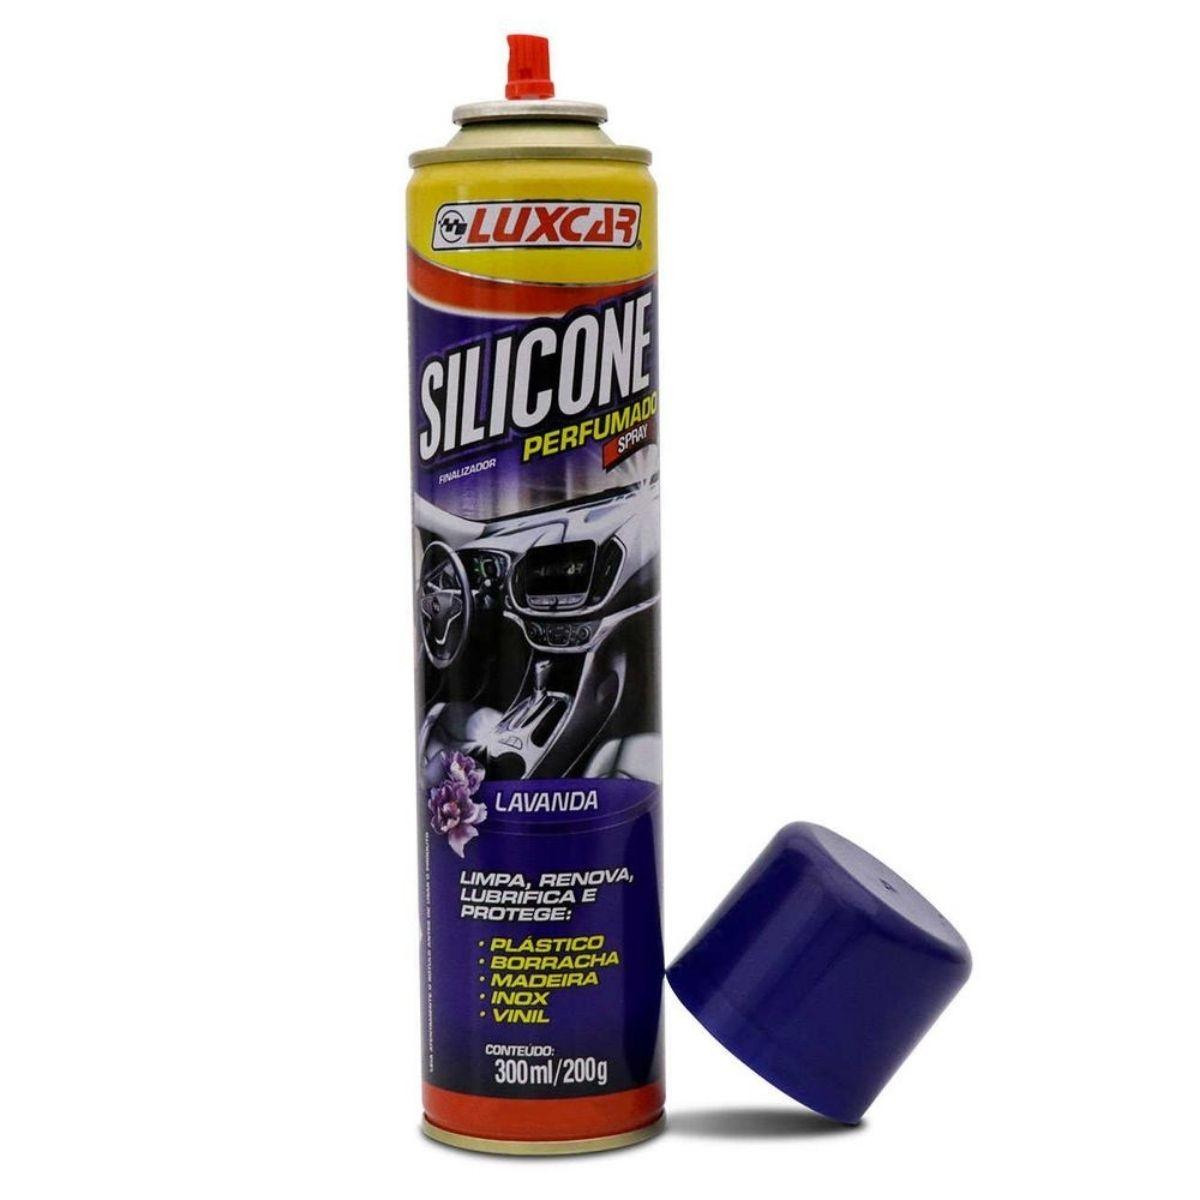 Silicone Perfumado Spray Lavanda 300ml